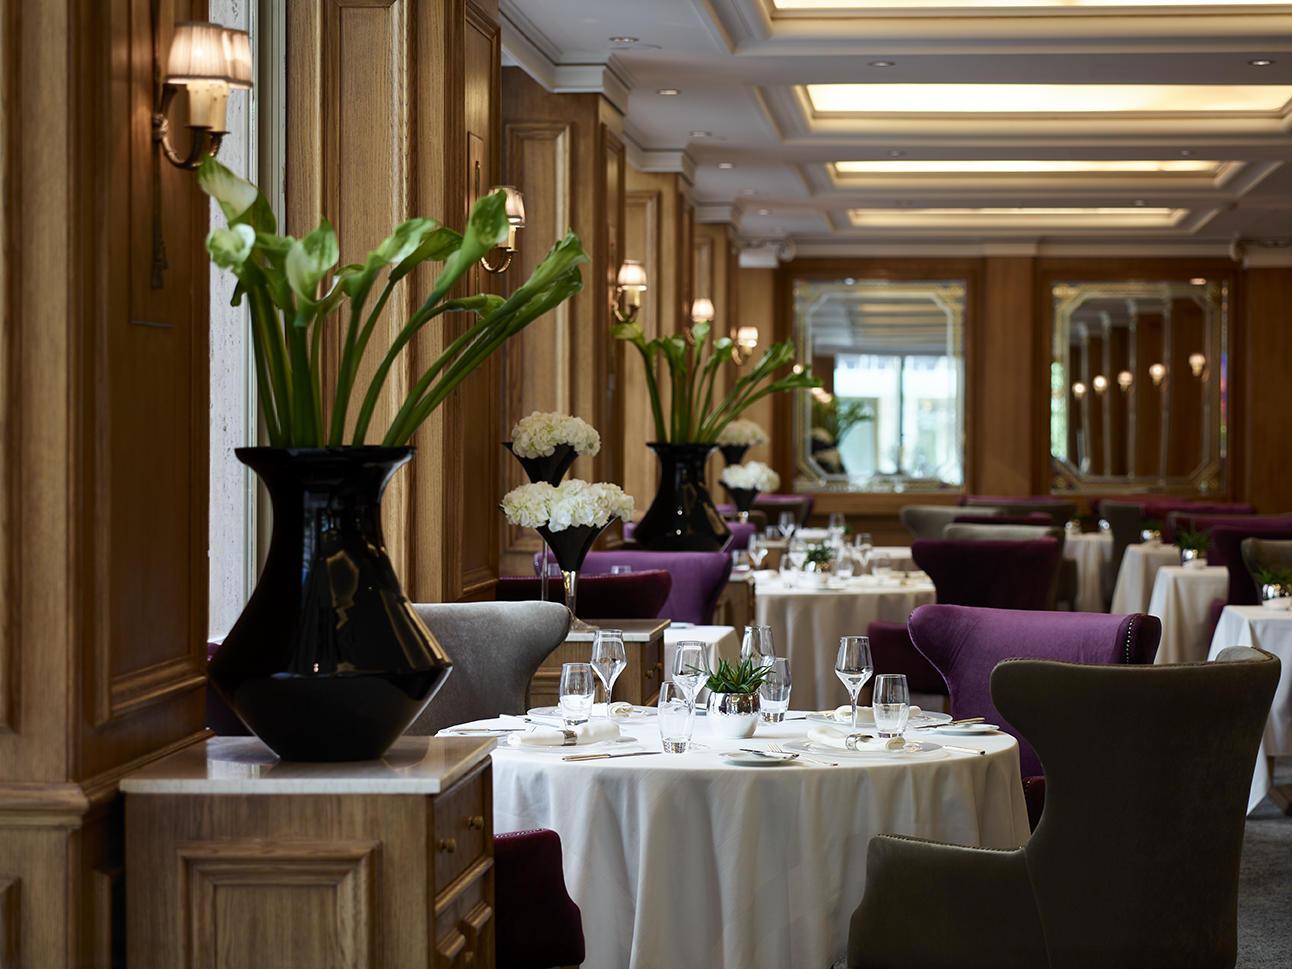 Parliament restaurant at NJV Athens Plaza hotel